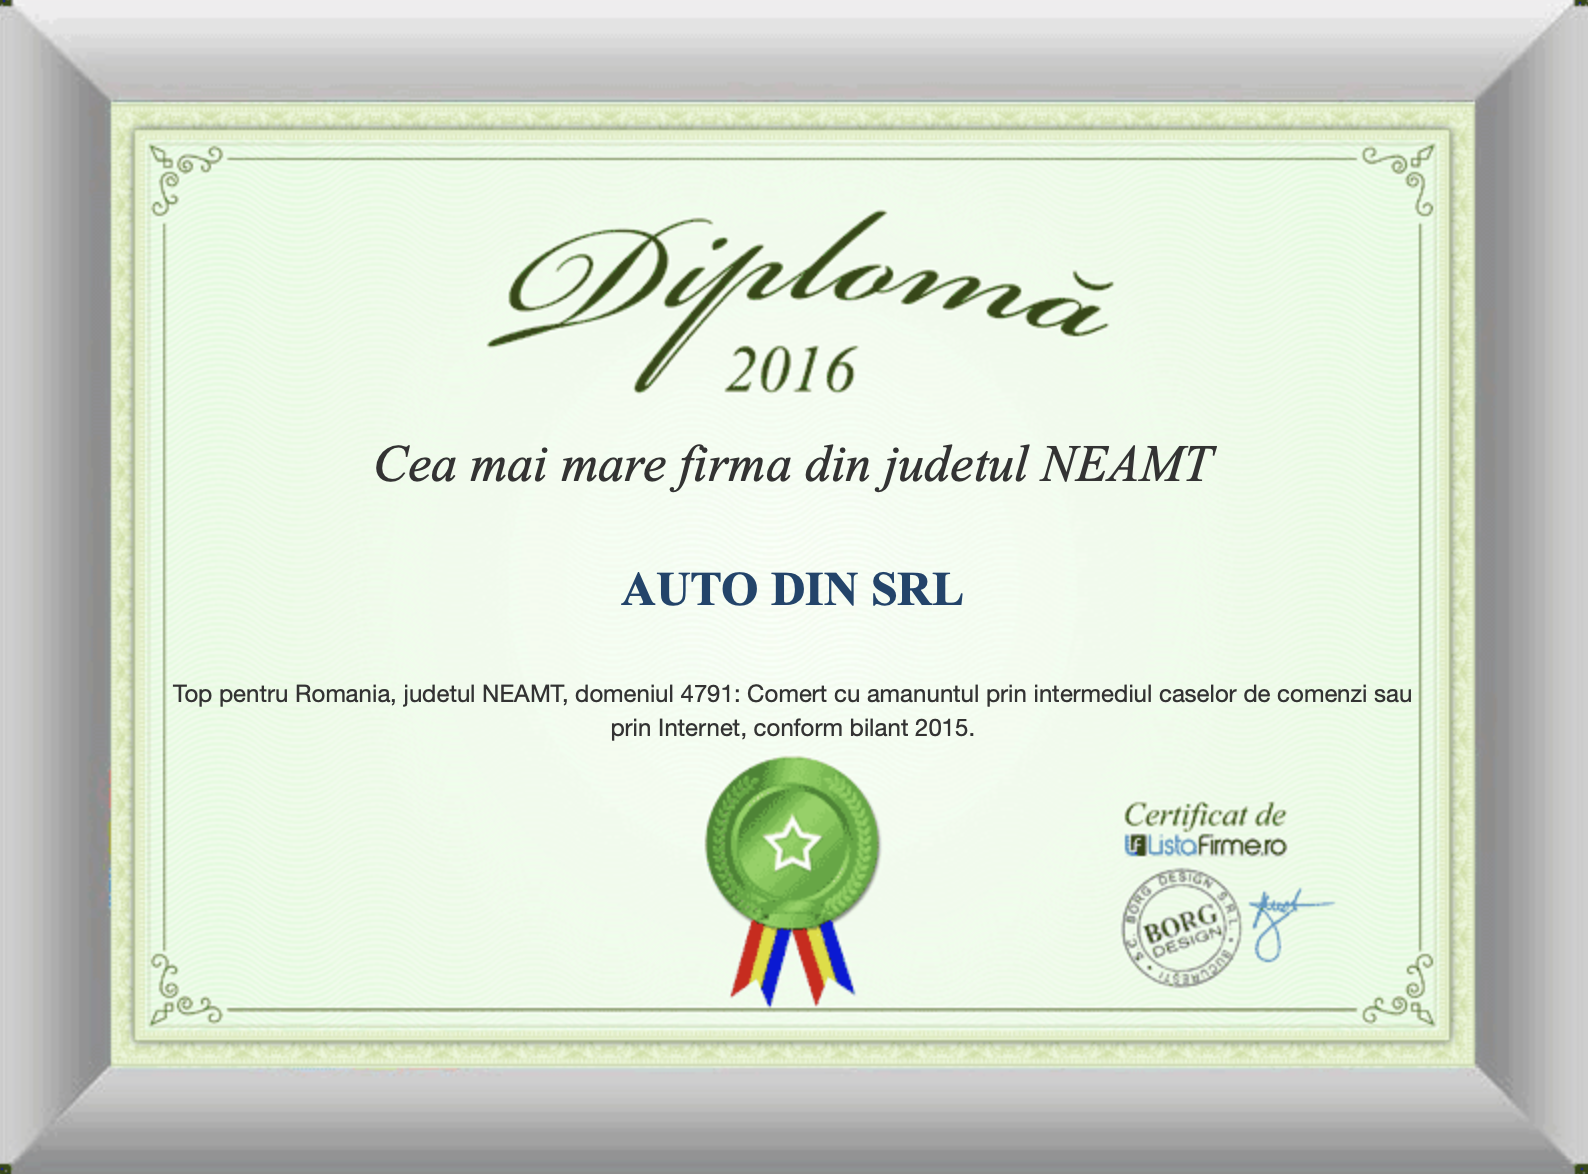 DiplomaAutoDin2016-2